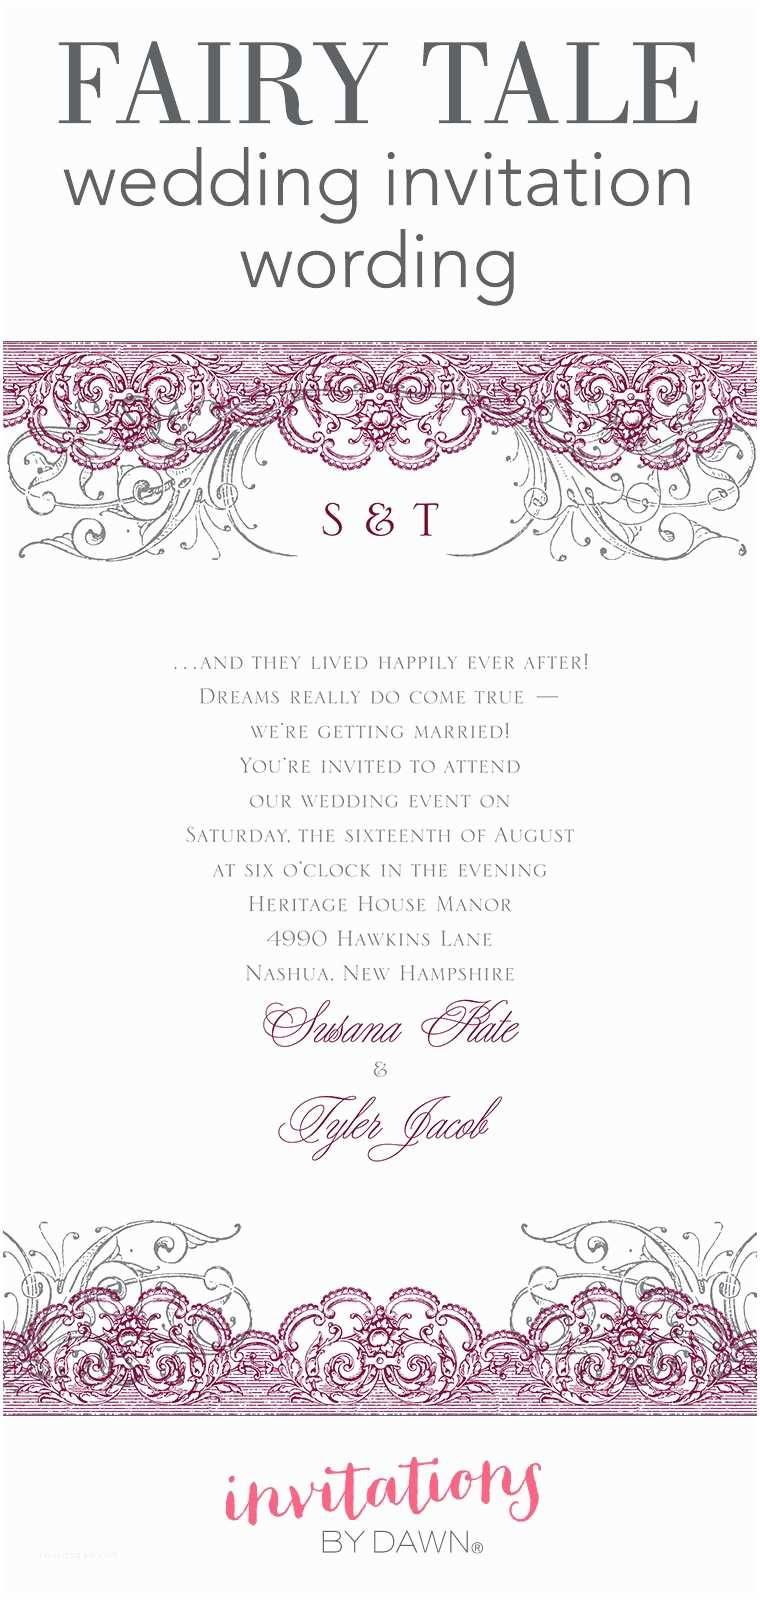 Wedding Invitation Msg Fairy Tale Wedding Invitation Wording